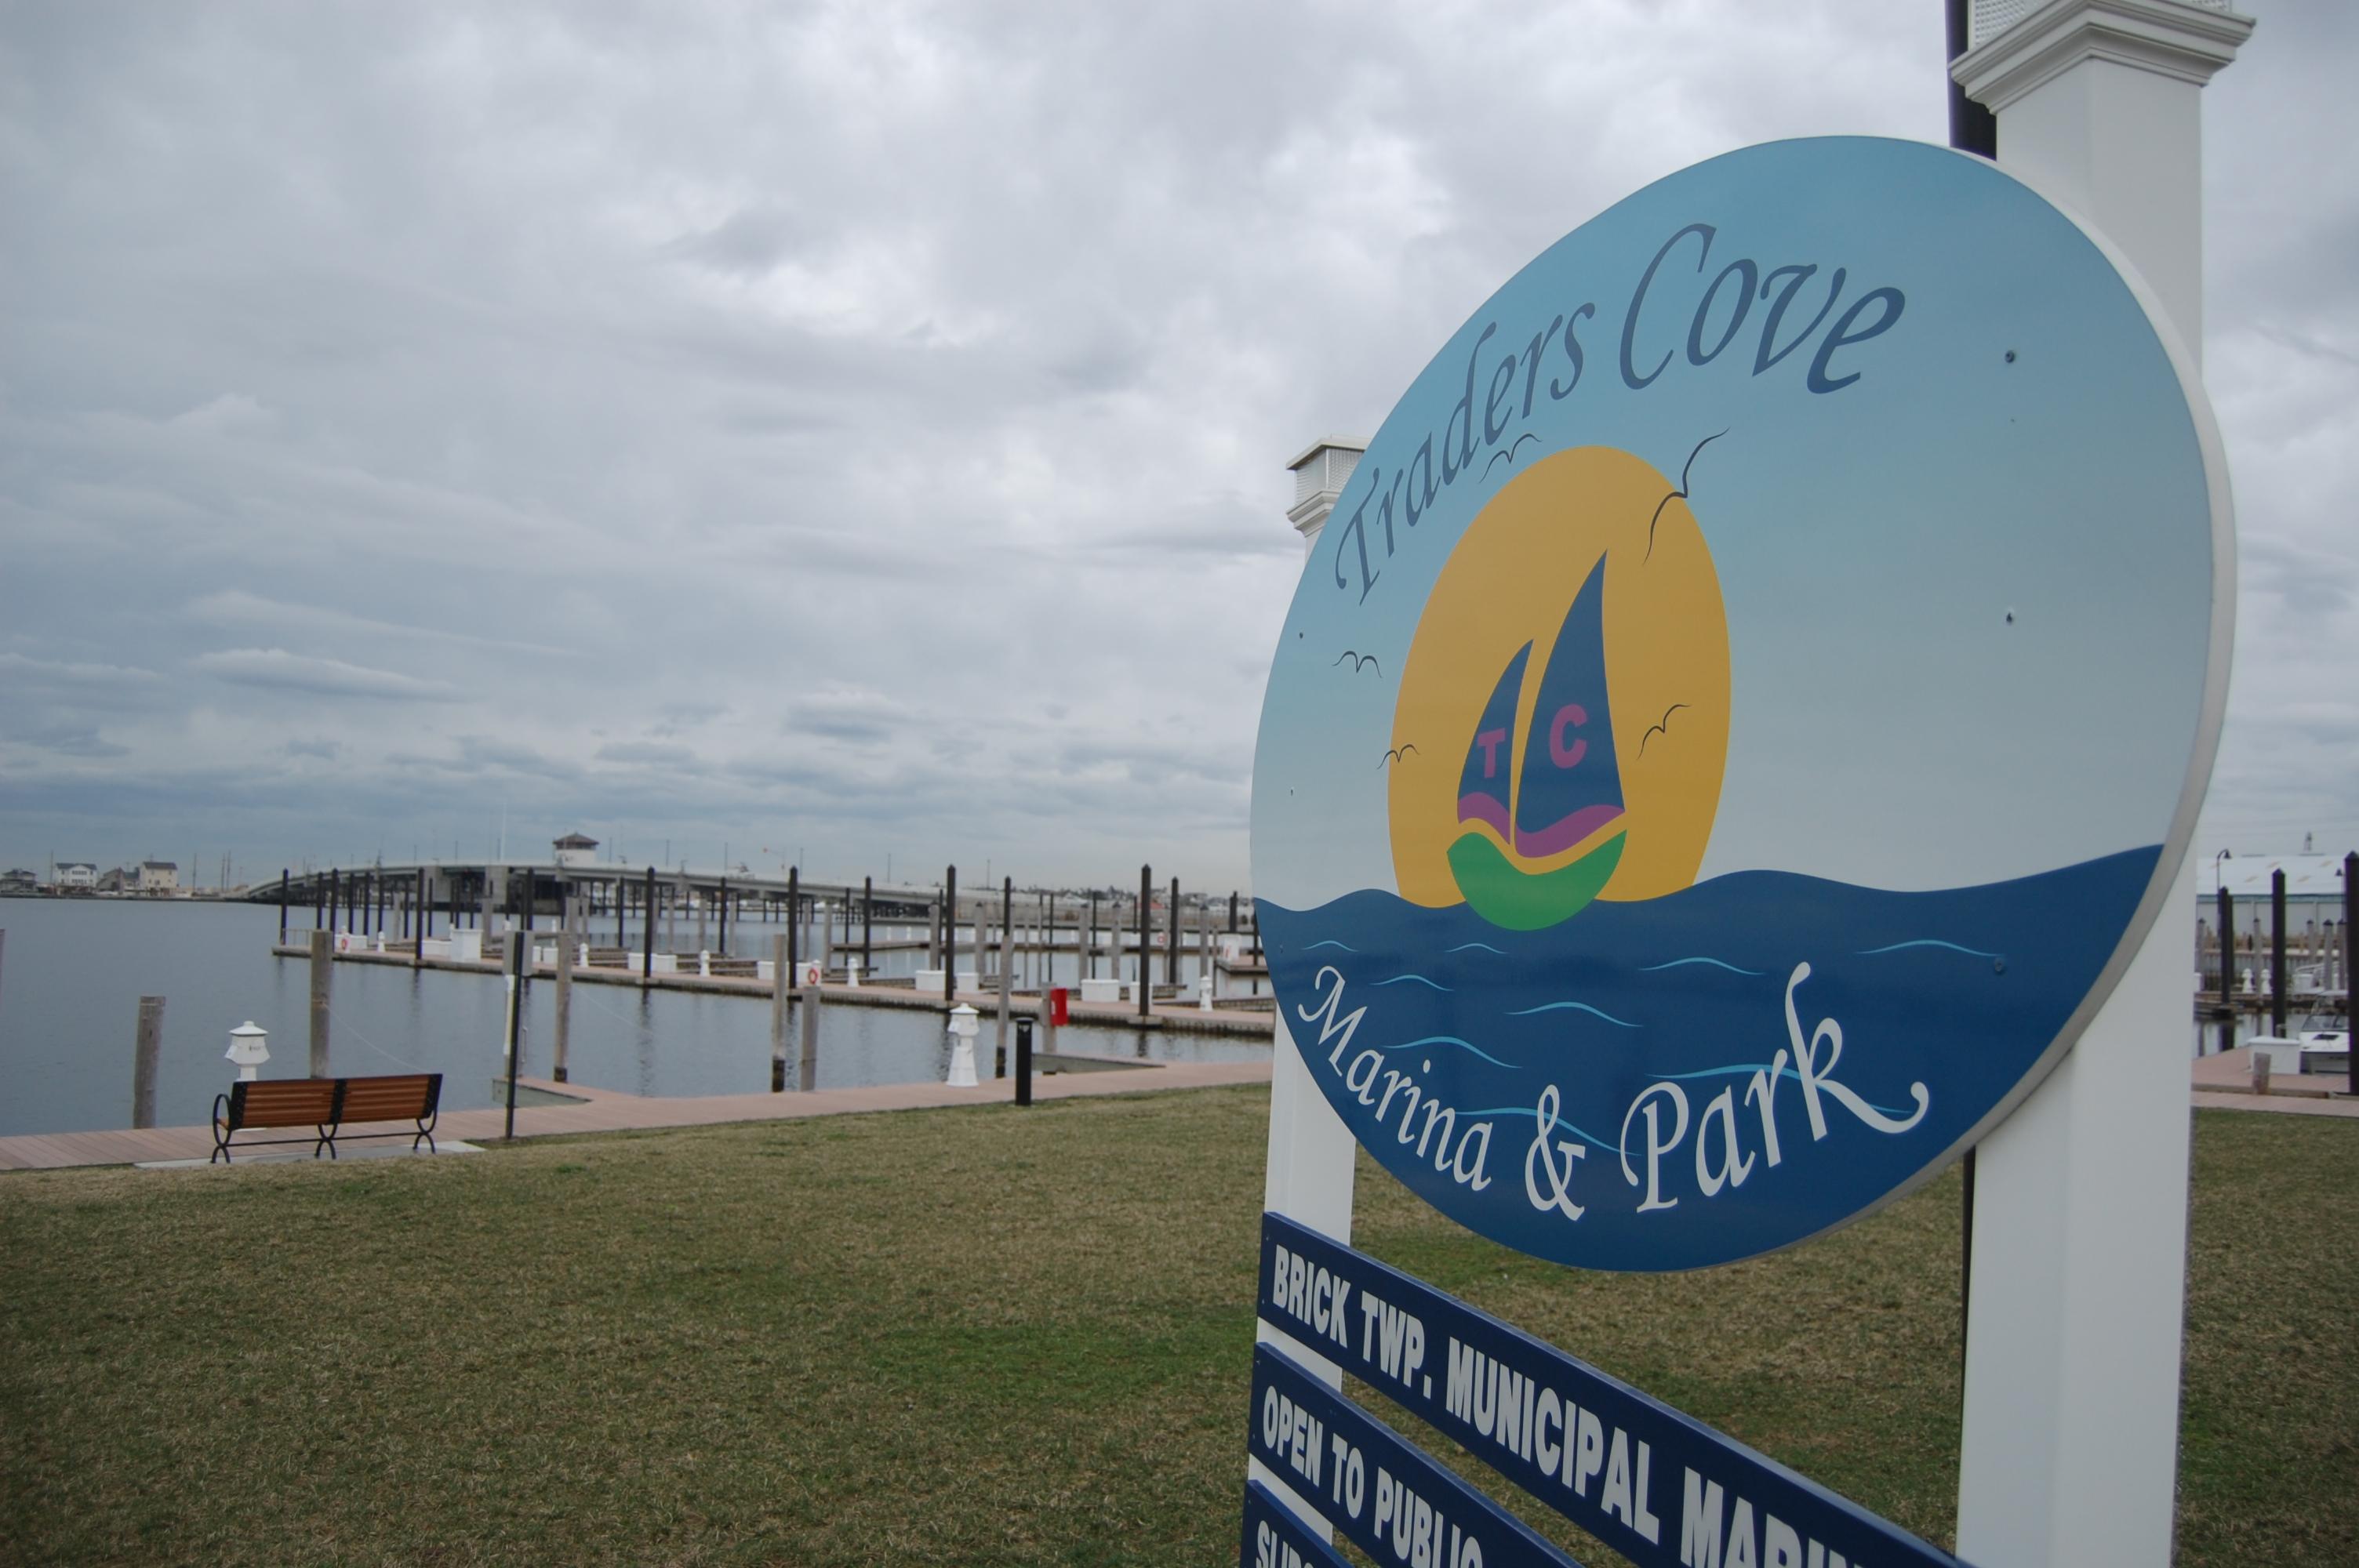 Traders Cove Marina and Park. (Photo: Daniel Nee)